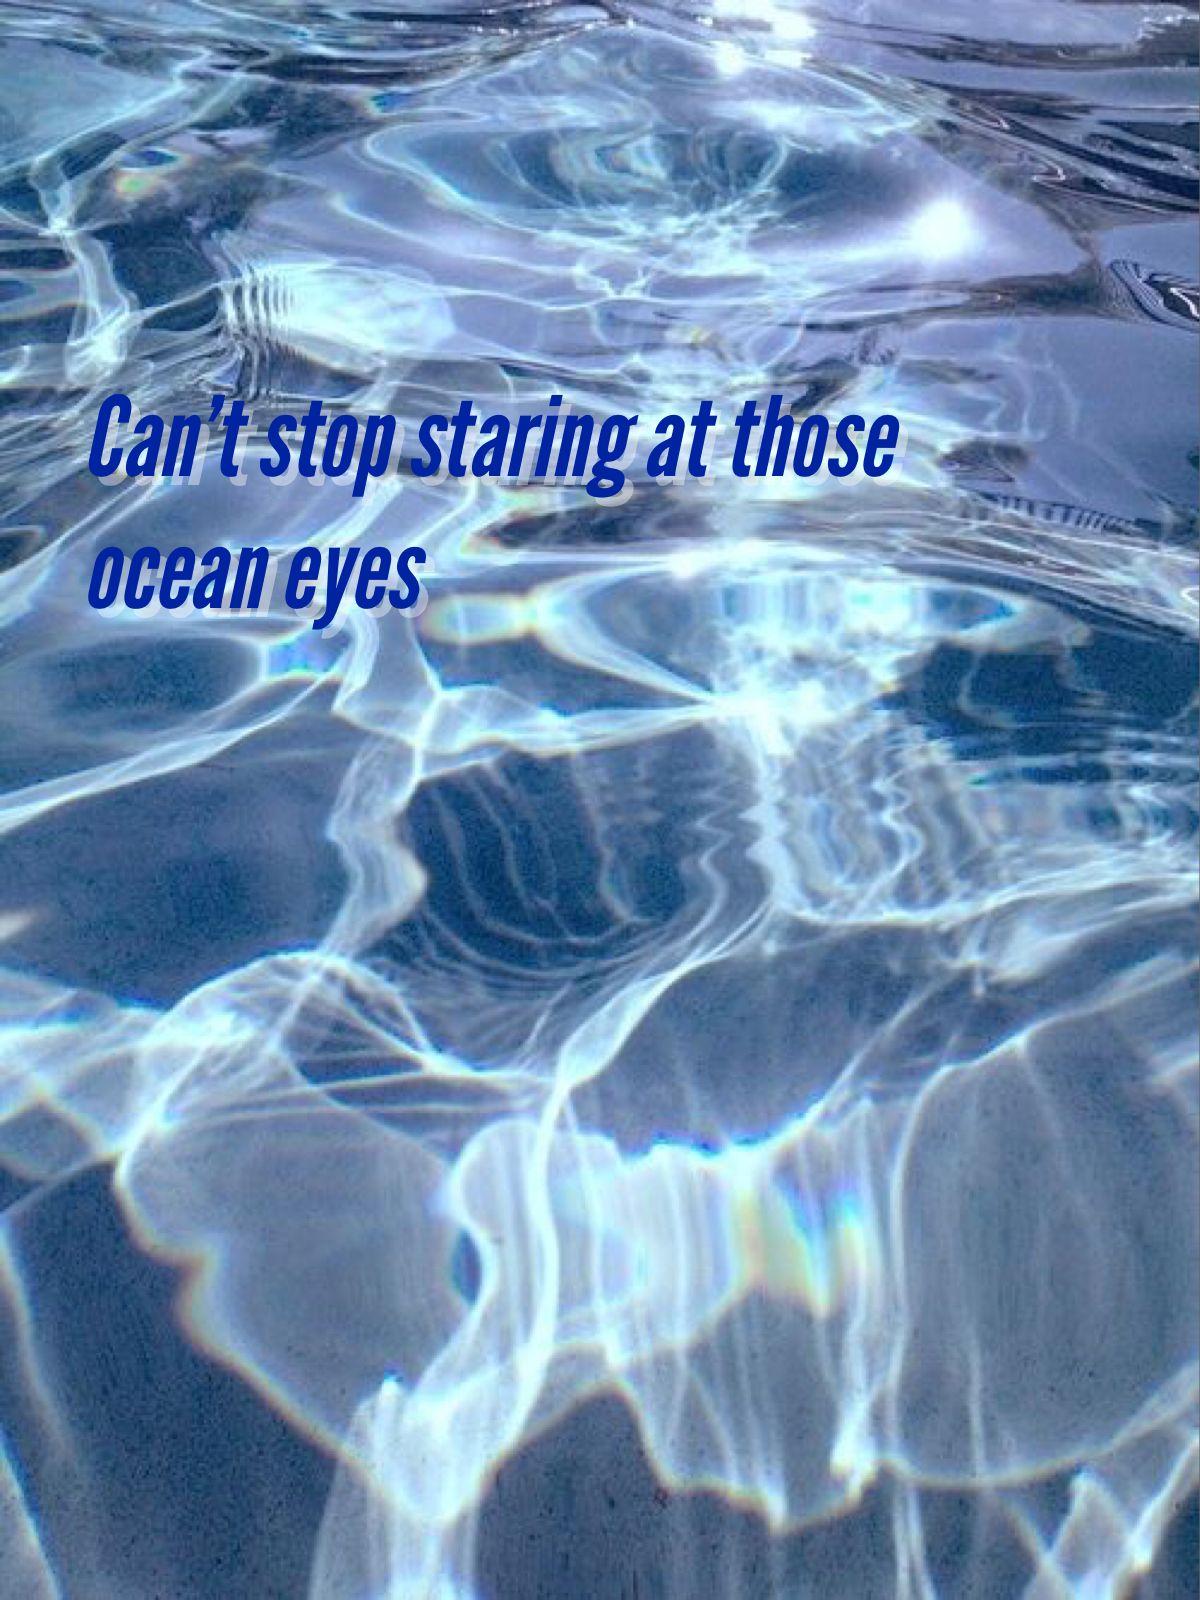 Billie Eilish Ocean Eyes Quote Lyrics Aesthetic Wallpapers Aesthetic Vintage Blue Aesthetic